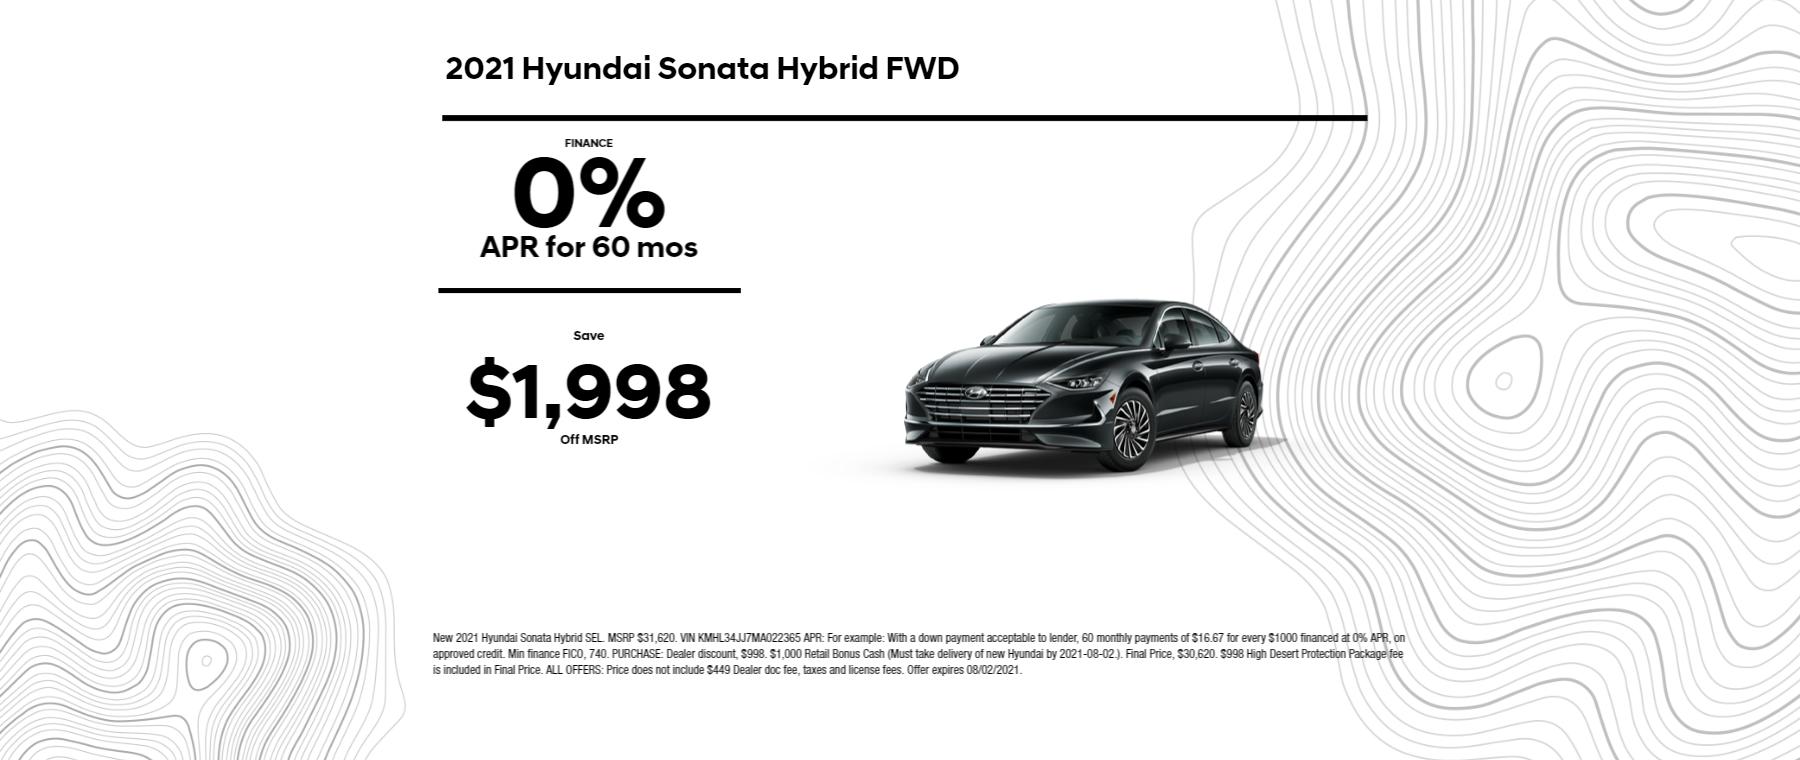 2021 Hyundai Sonata Hybrid FWD